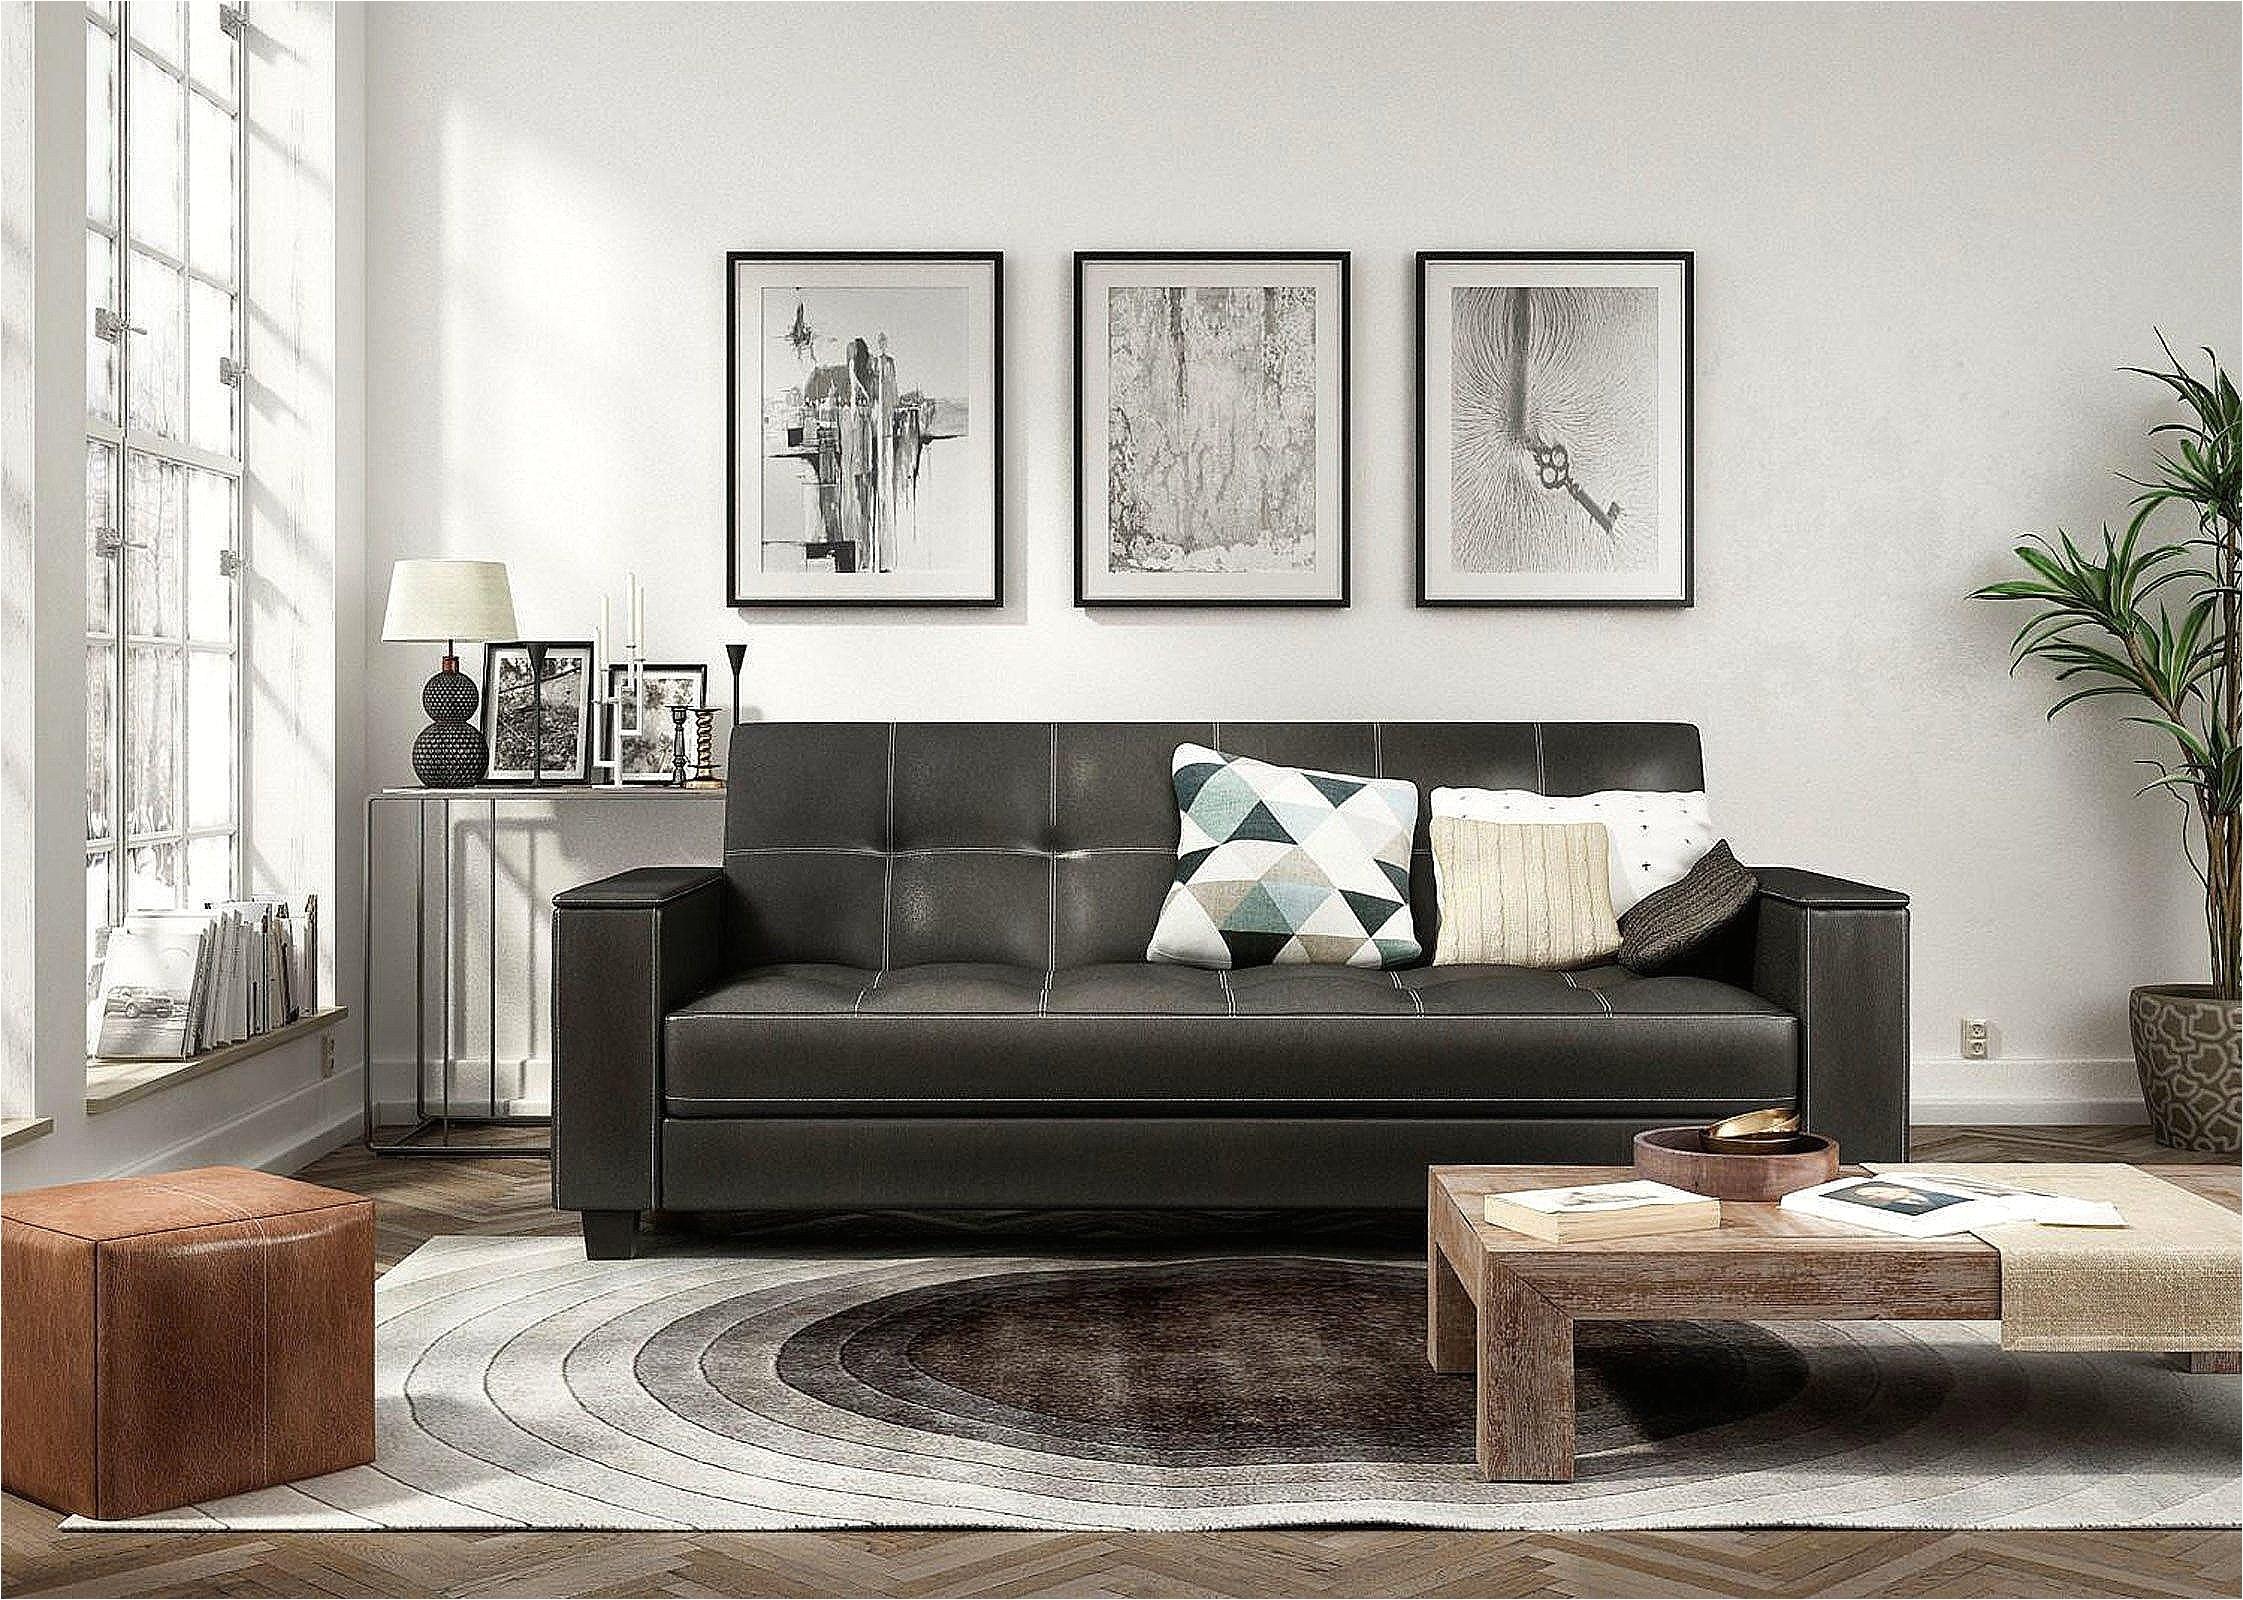 Living Room Couch Ideas Very Best Modern Living Room Furniture New Gunstige sofa Macys Furniture 0d